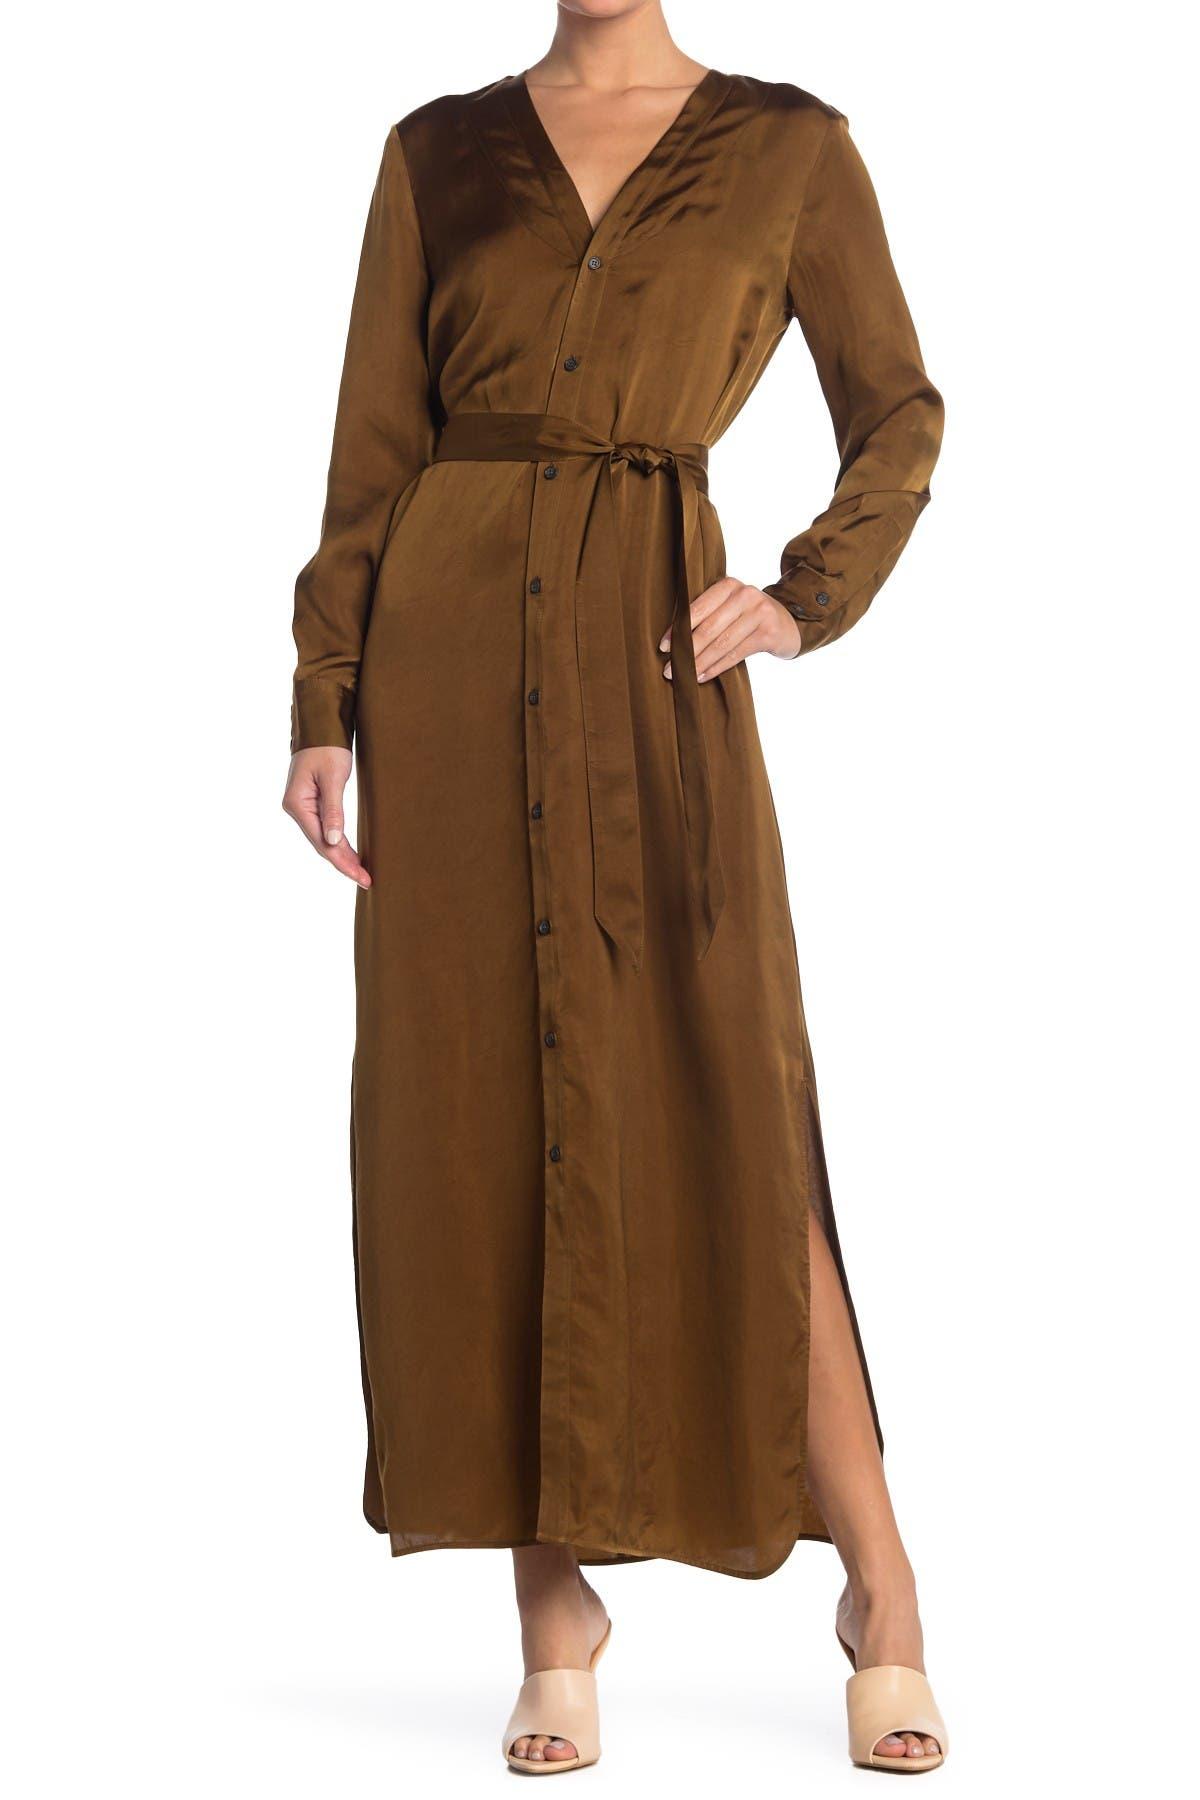 Image of Billy Reid Paneled Robe Dress